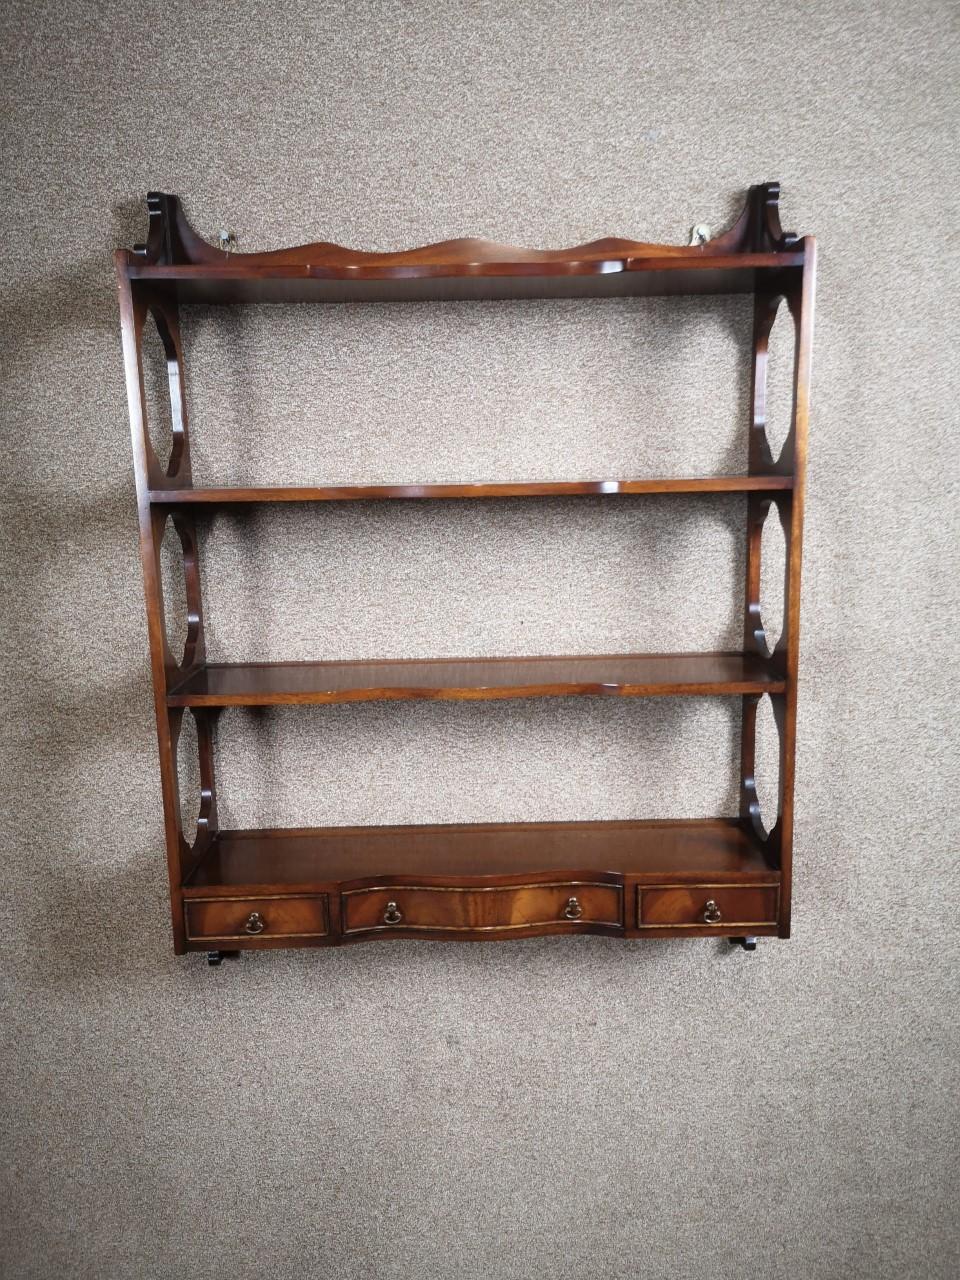 Reprodux Bevan Funnel wall rack画像